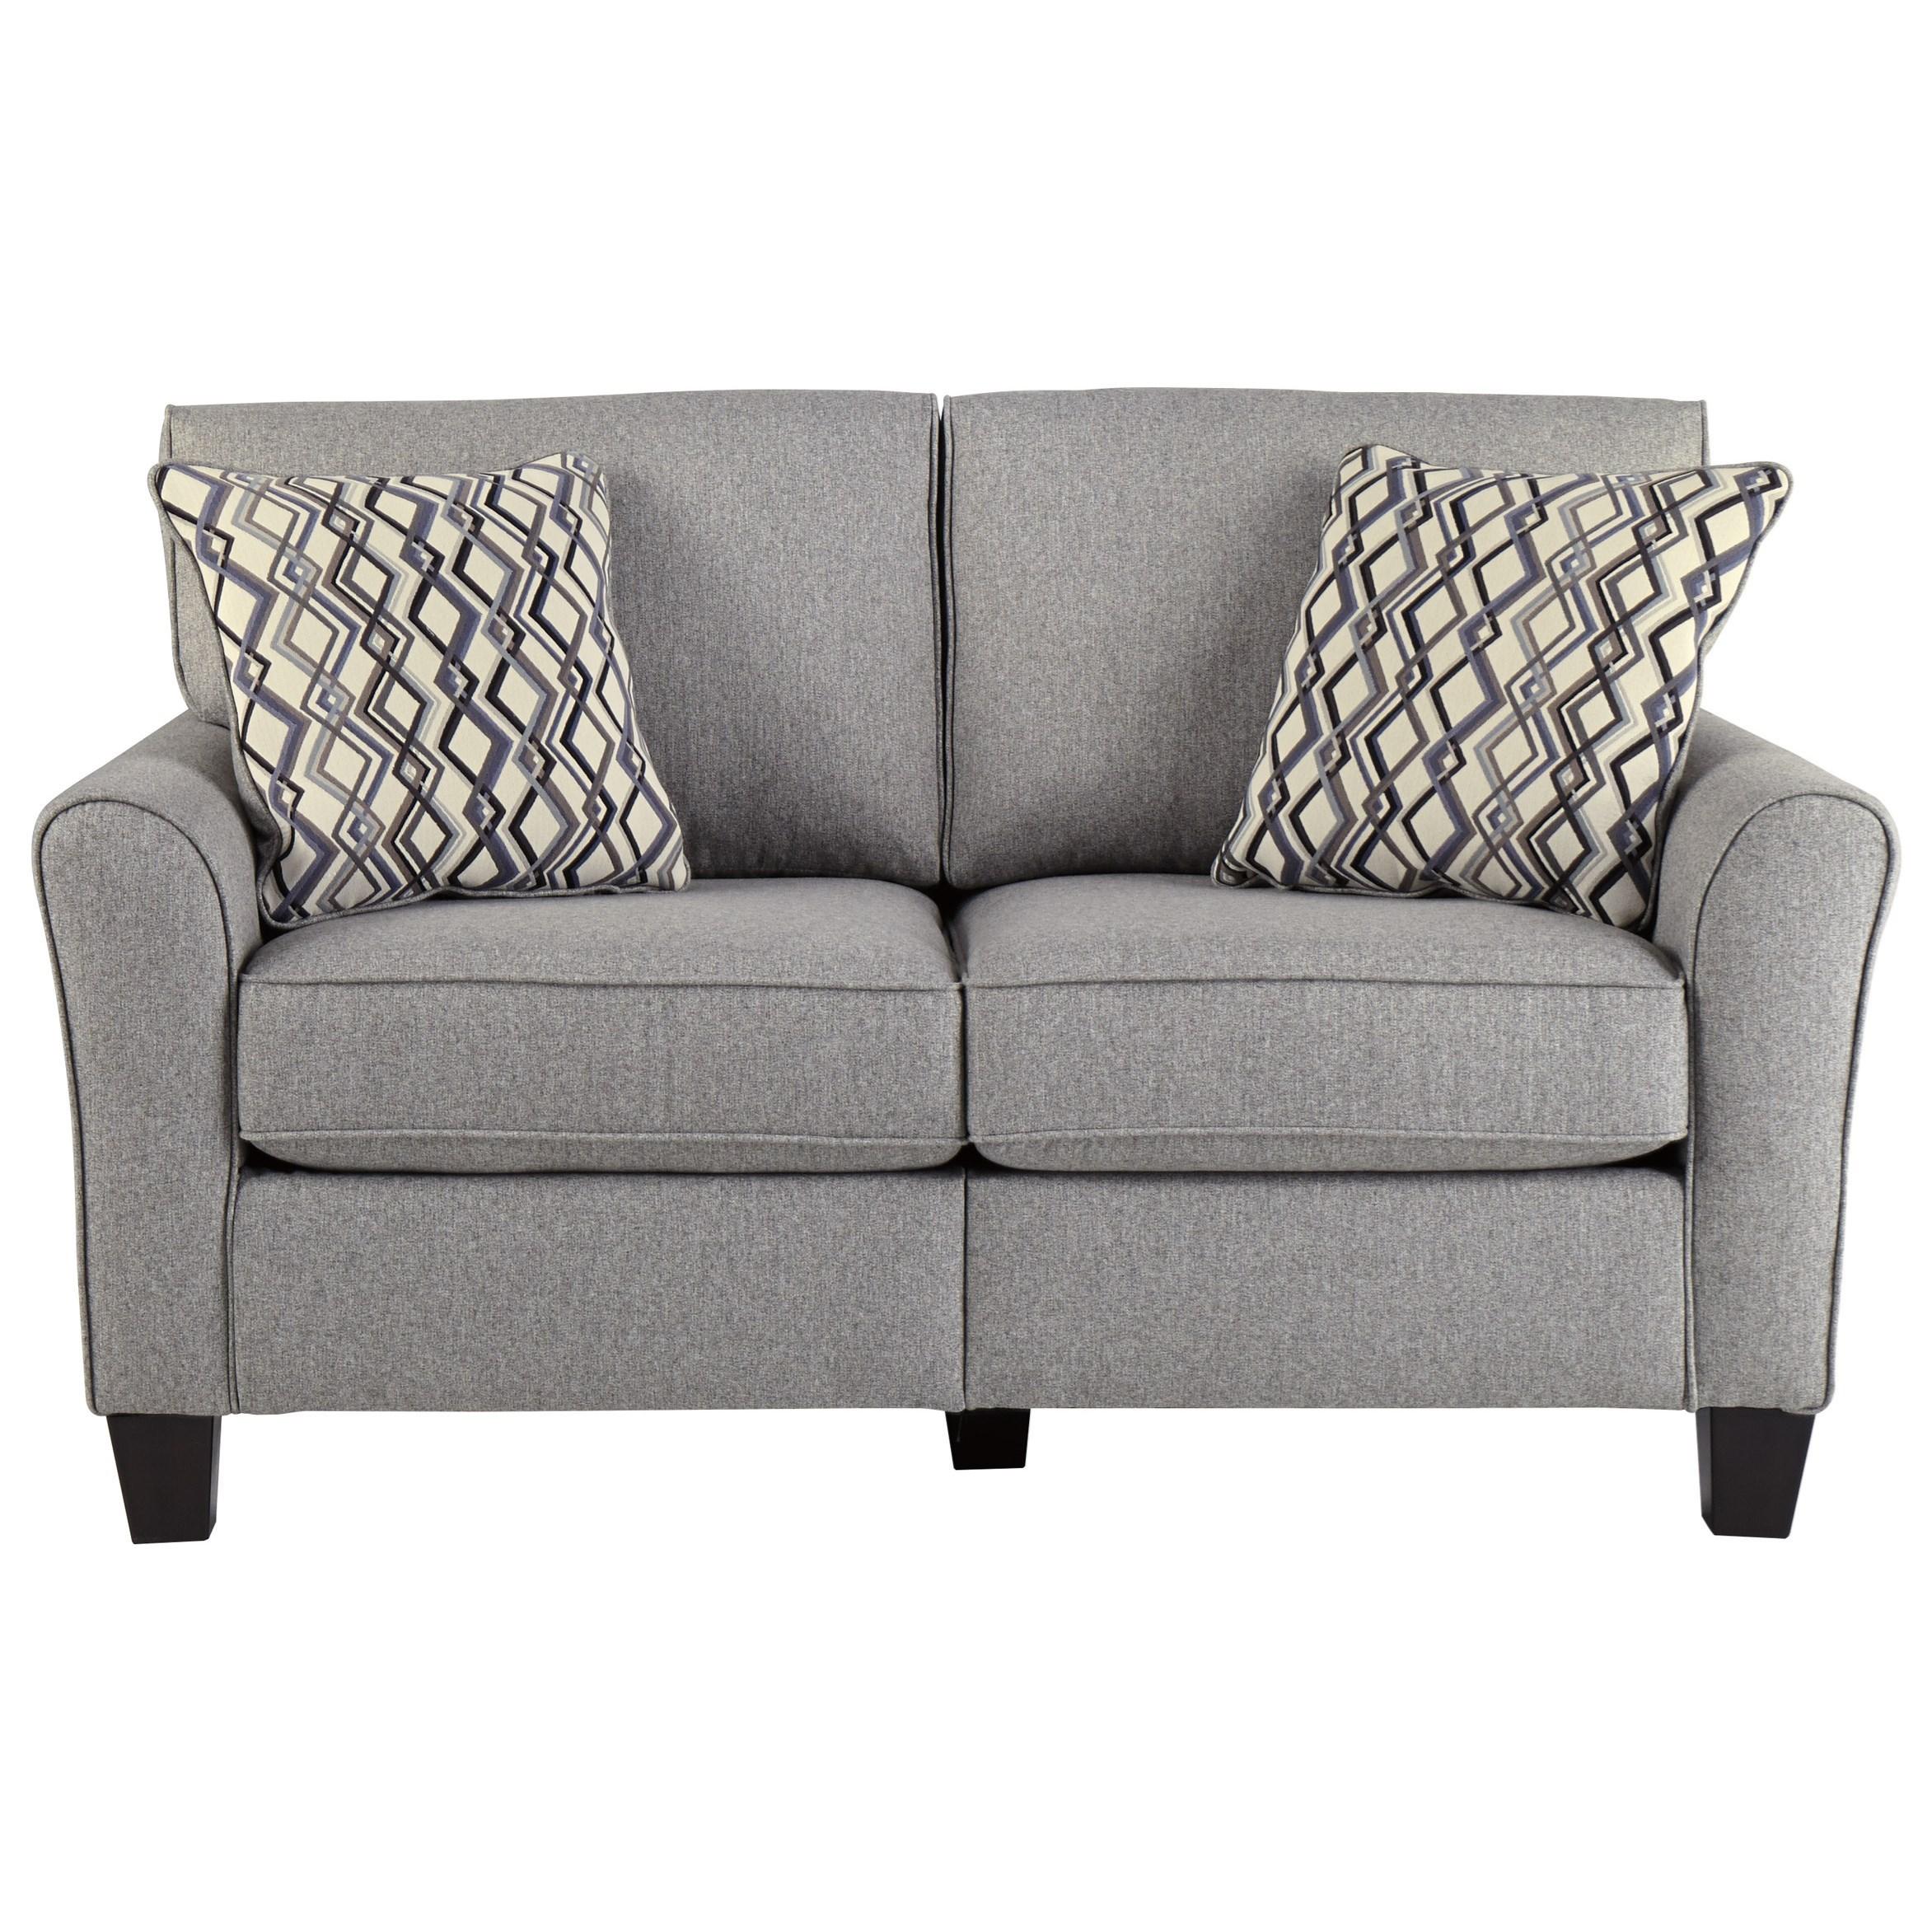 Strehela Loveseat by Signature Design by Ashley at Lapeer Furniture & Mattress Center